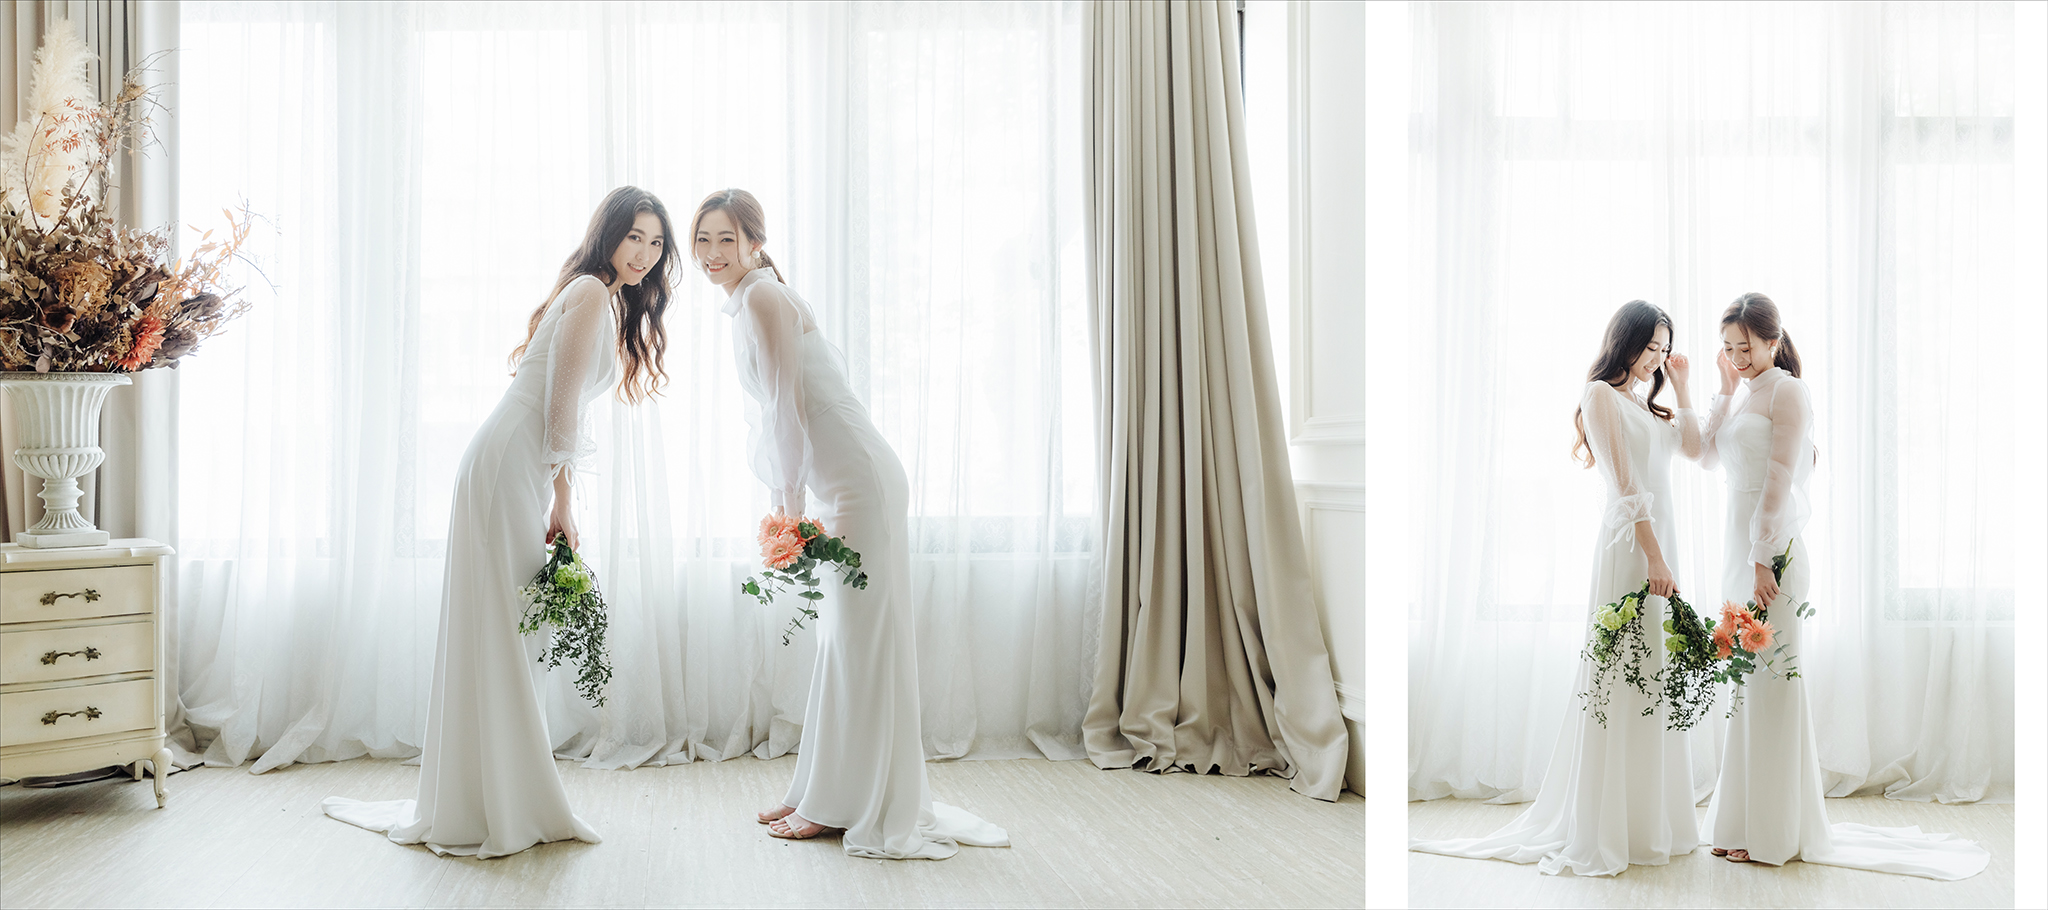 49929558652 94c0b2e3b2 o - 【閨蜜婚紗】+Jessy & Tiffany+